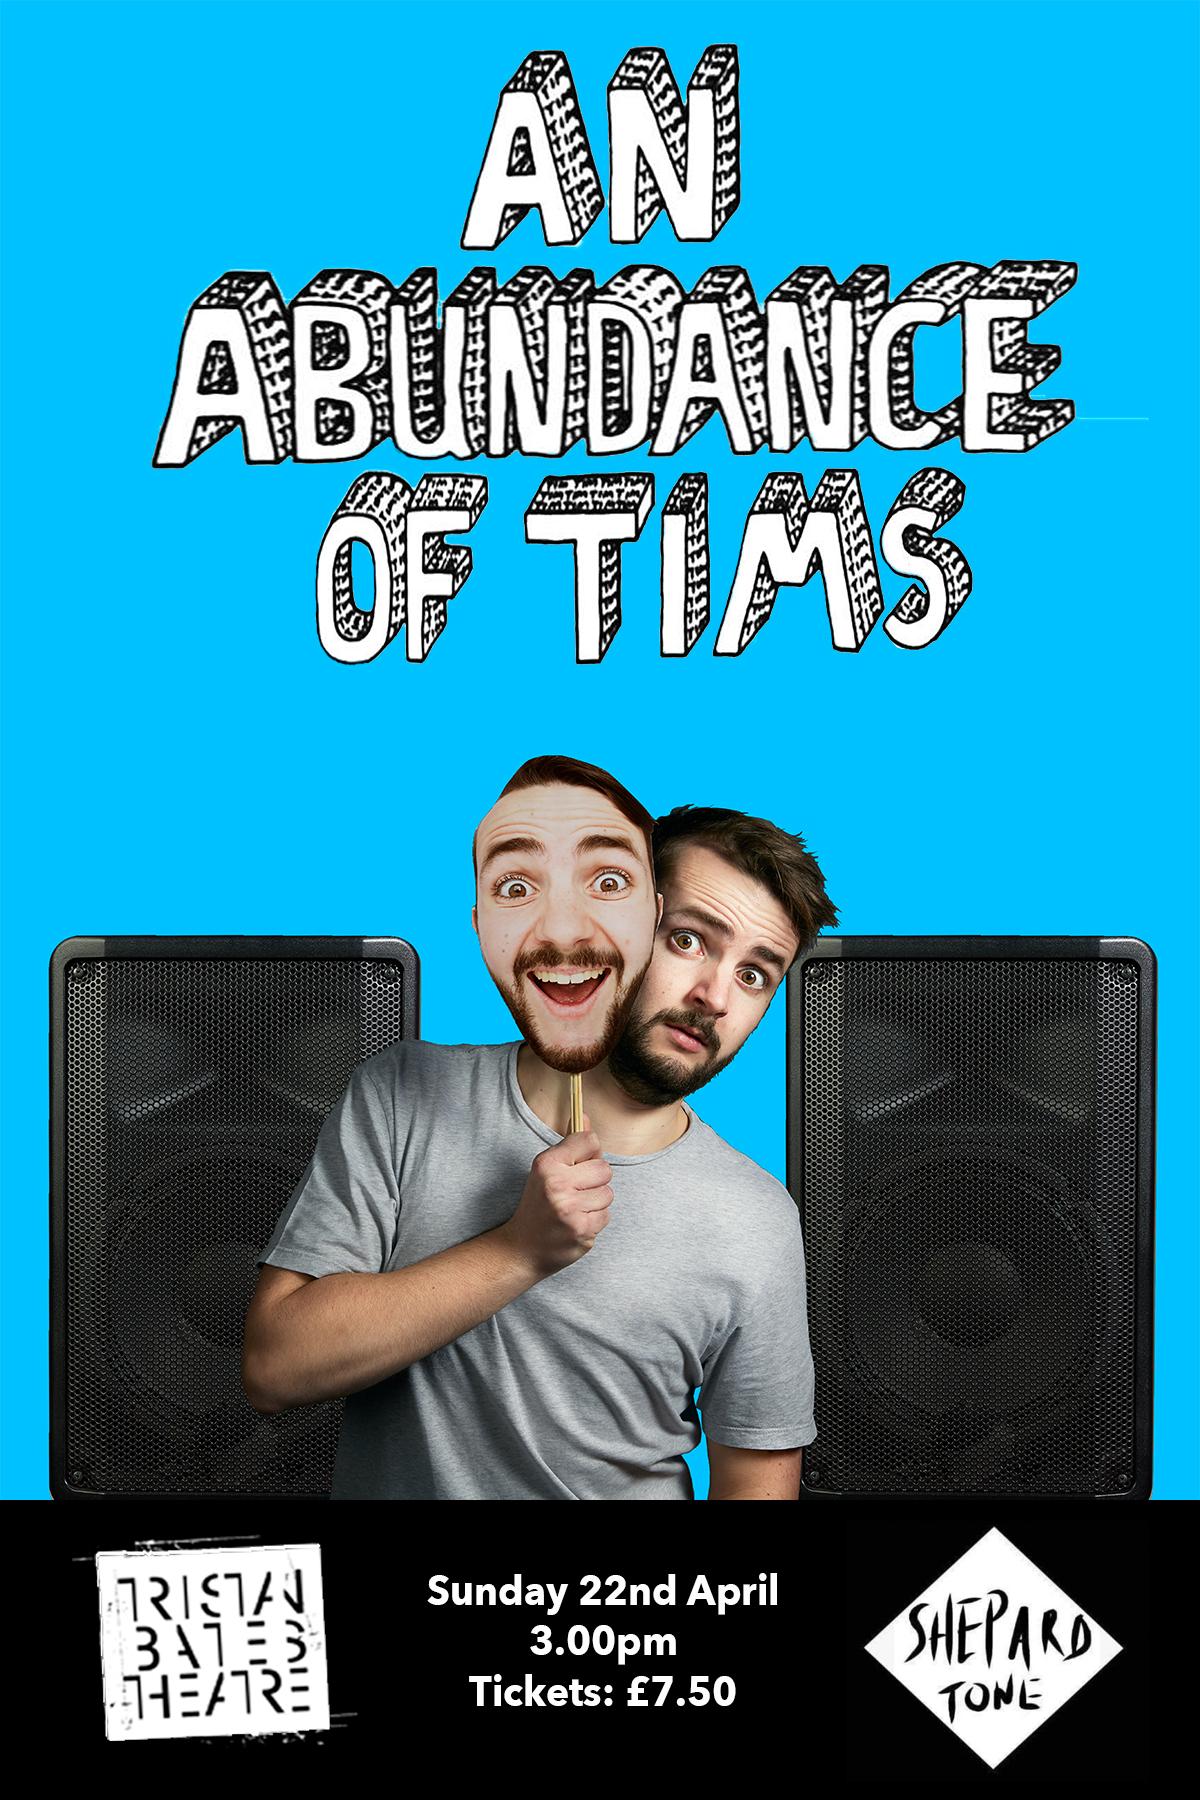 Abundance Tristan Bates Poster.jpg